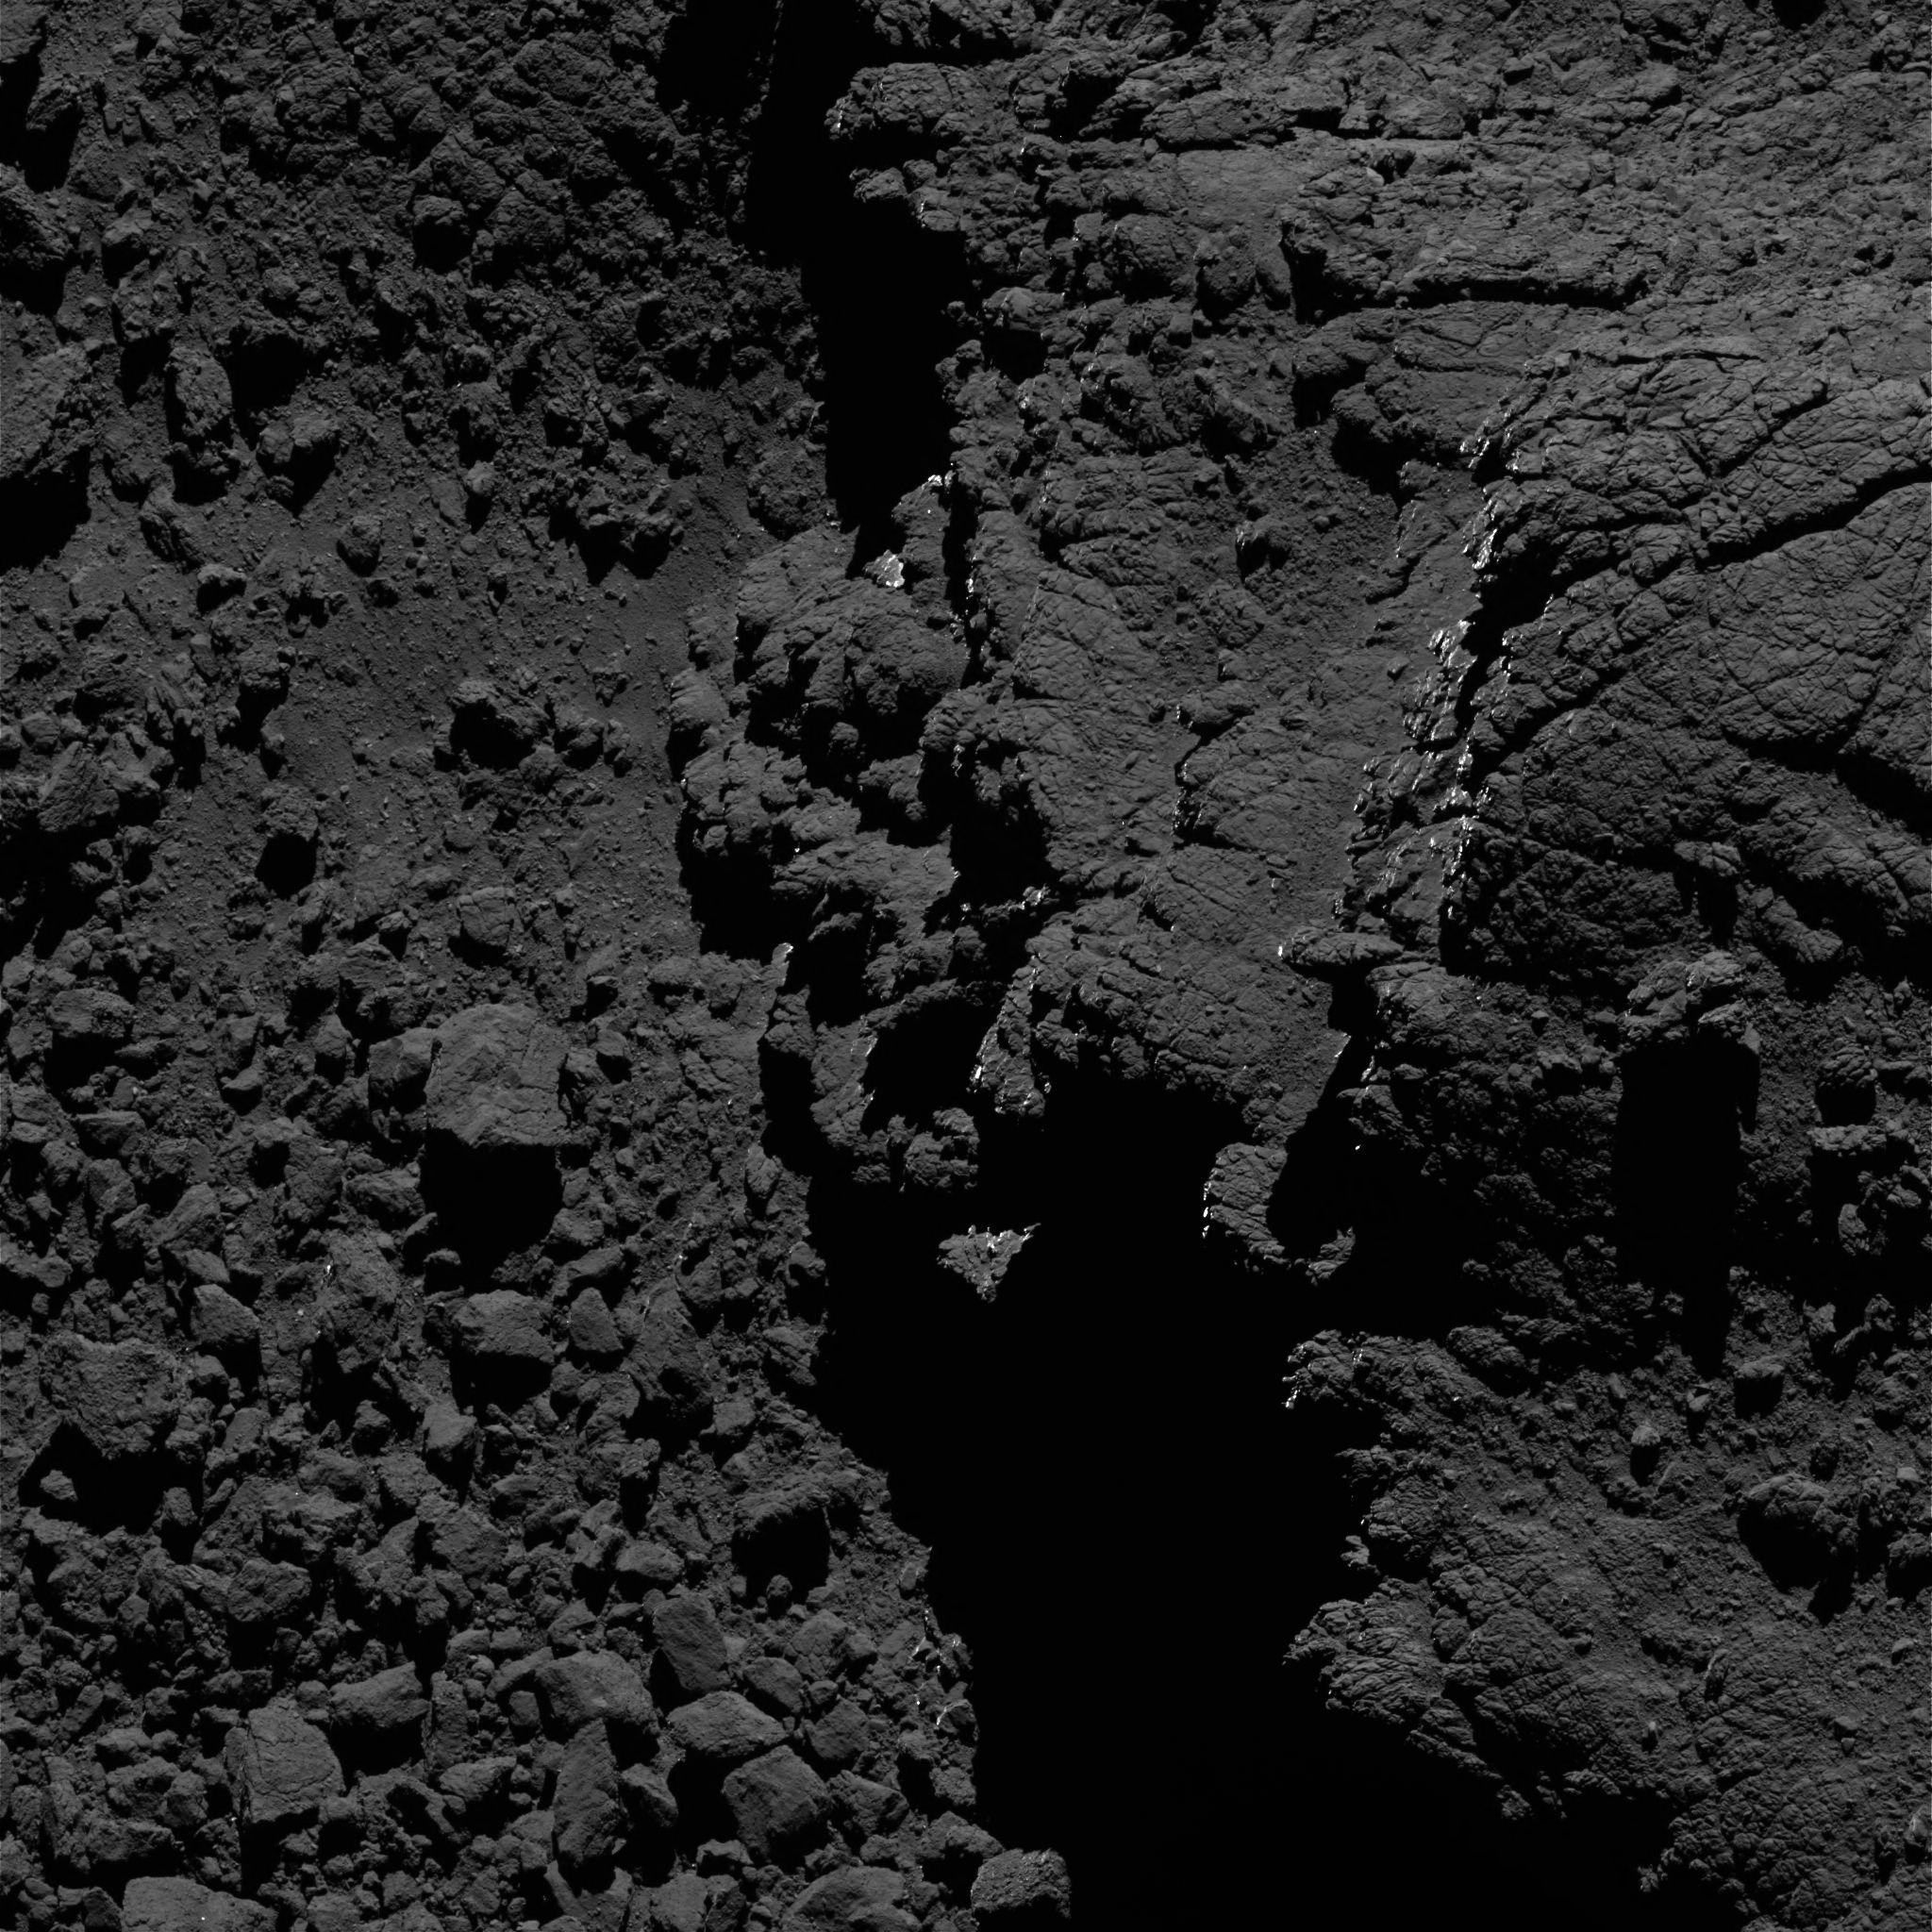 1567215477195-Rosetta_OSIRIS_NAC_comet_67P_20160827T211748.jpg